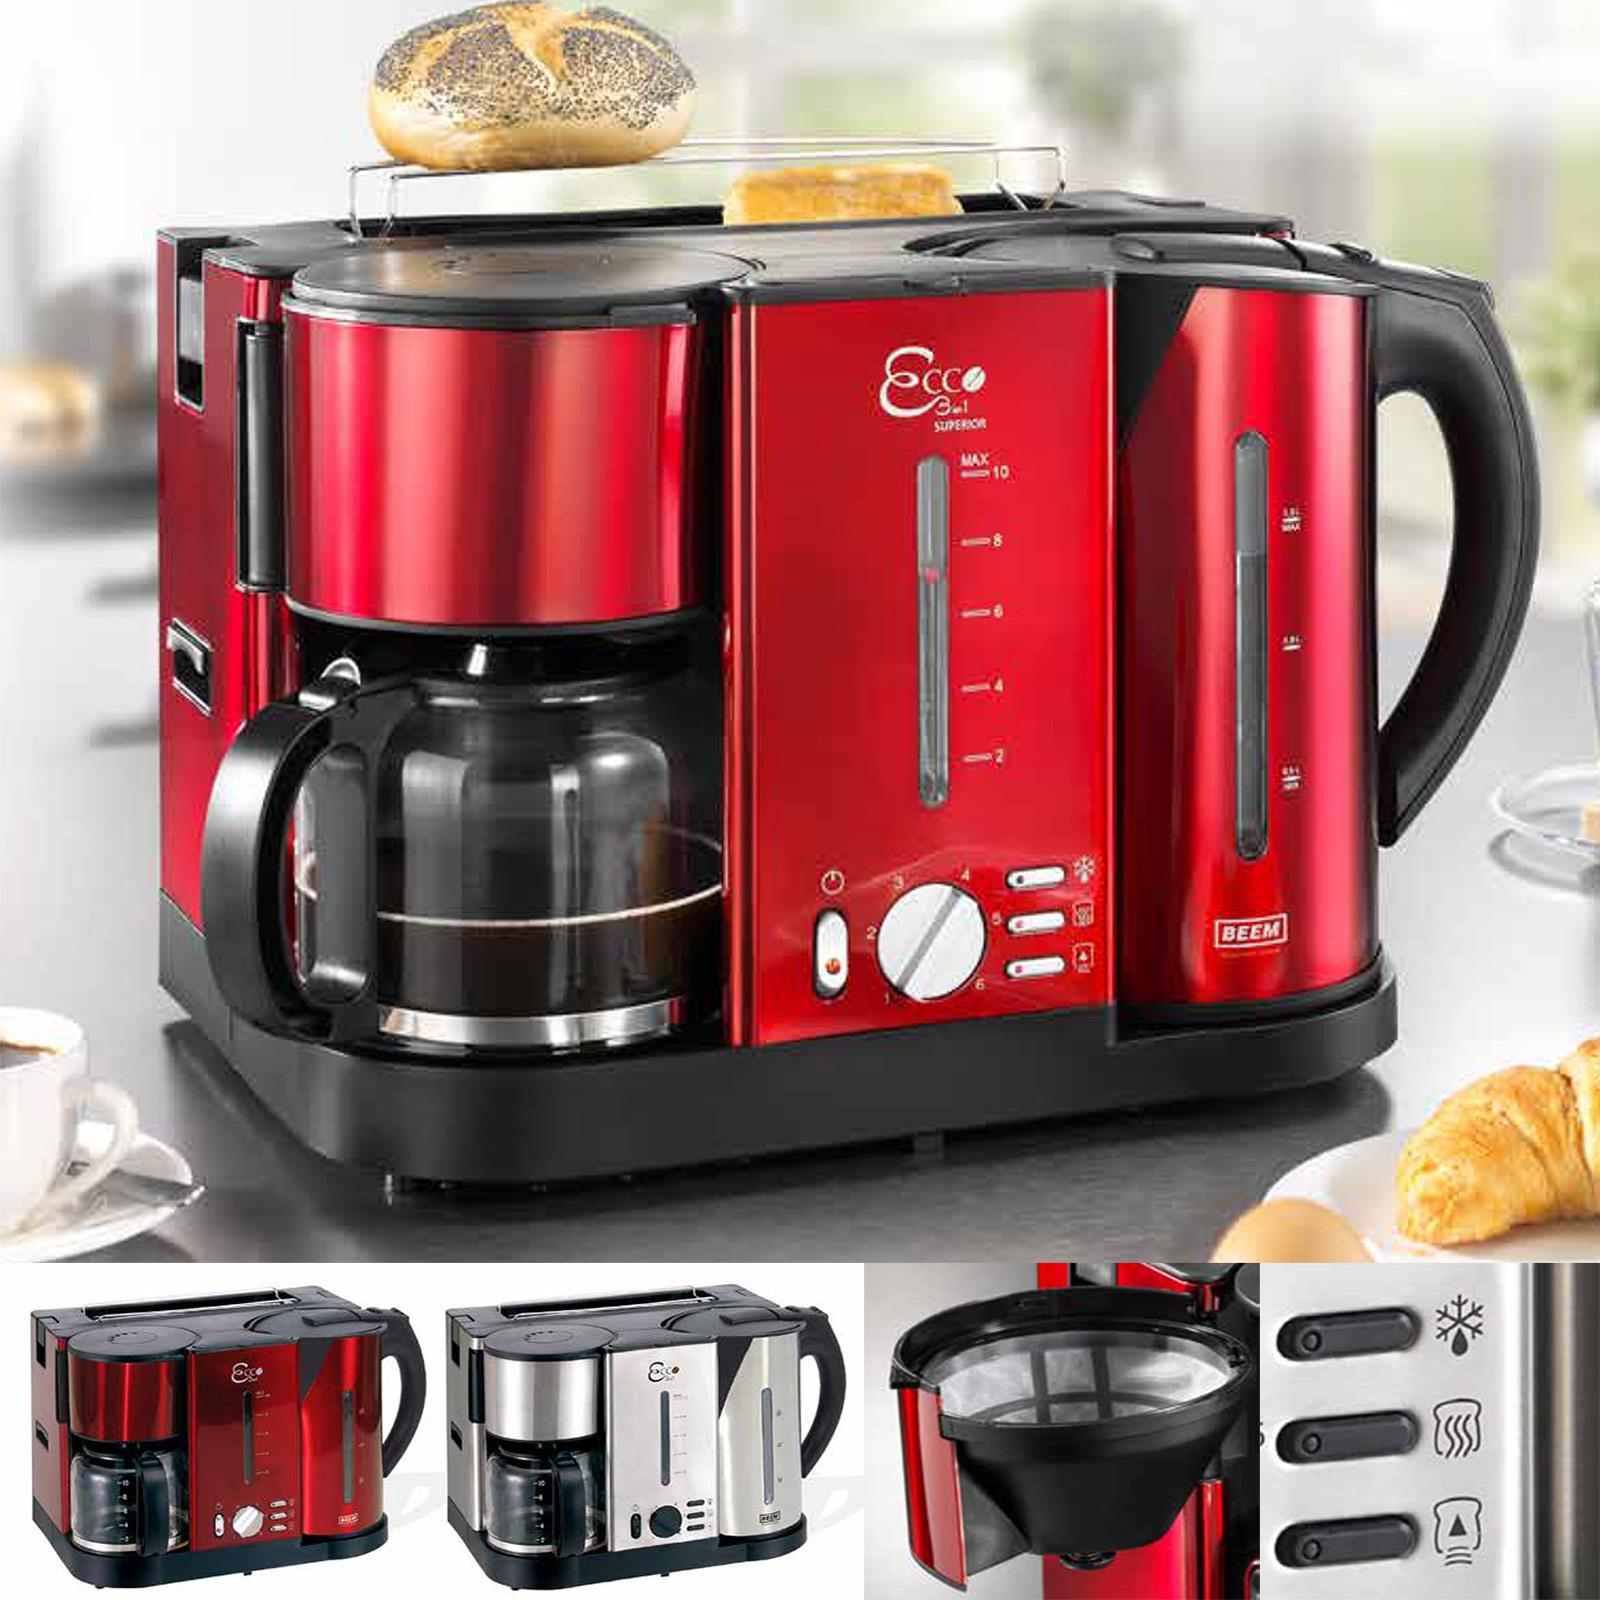 3 in 1 fr hst ckscenter fr hst cks toaster kaffemaschine wasserkocher in 2 farbe. Black Bedroom Furniture Sets. Home Design Ideas